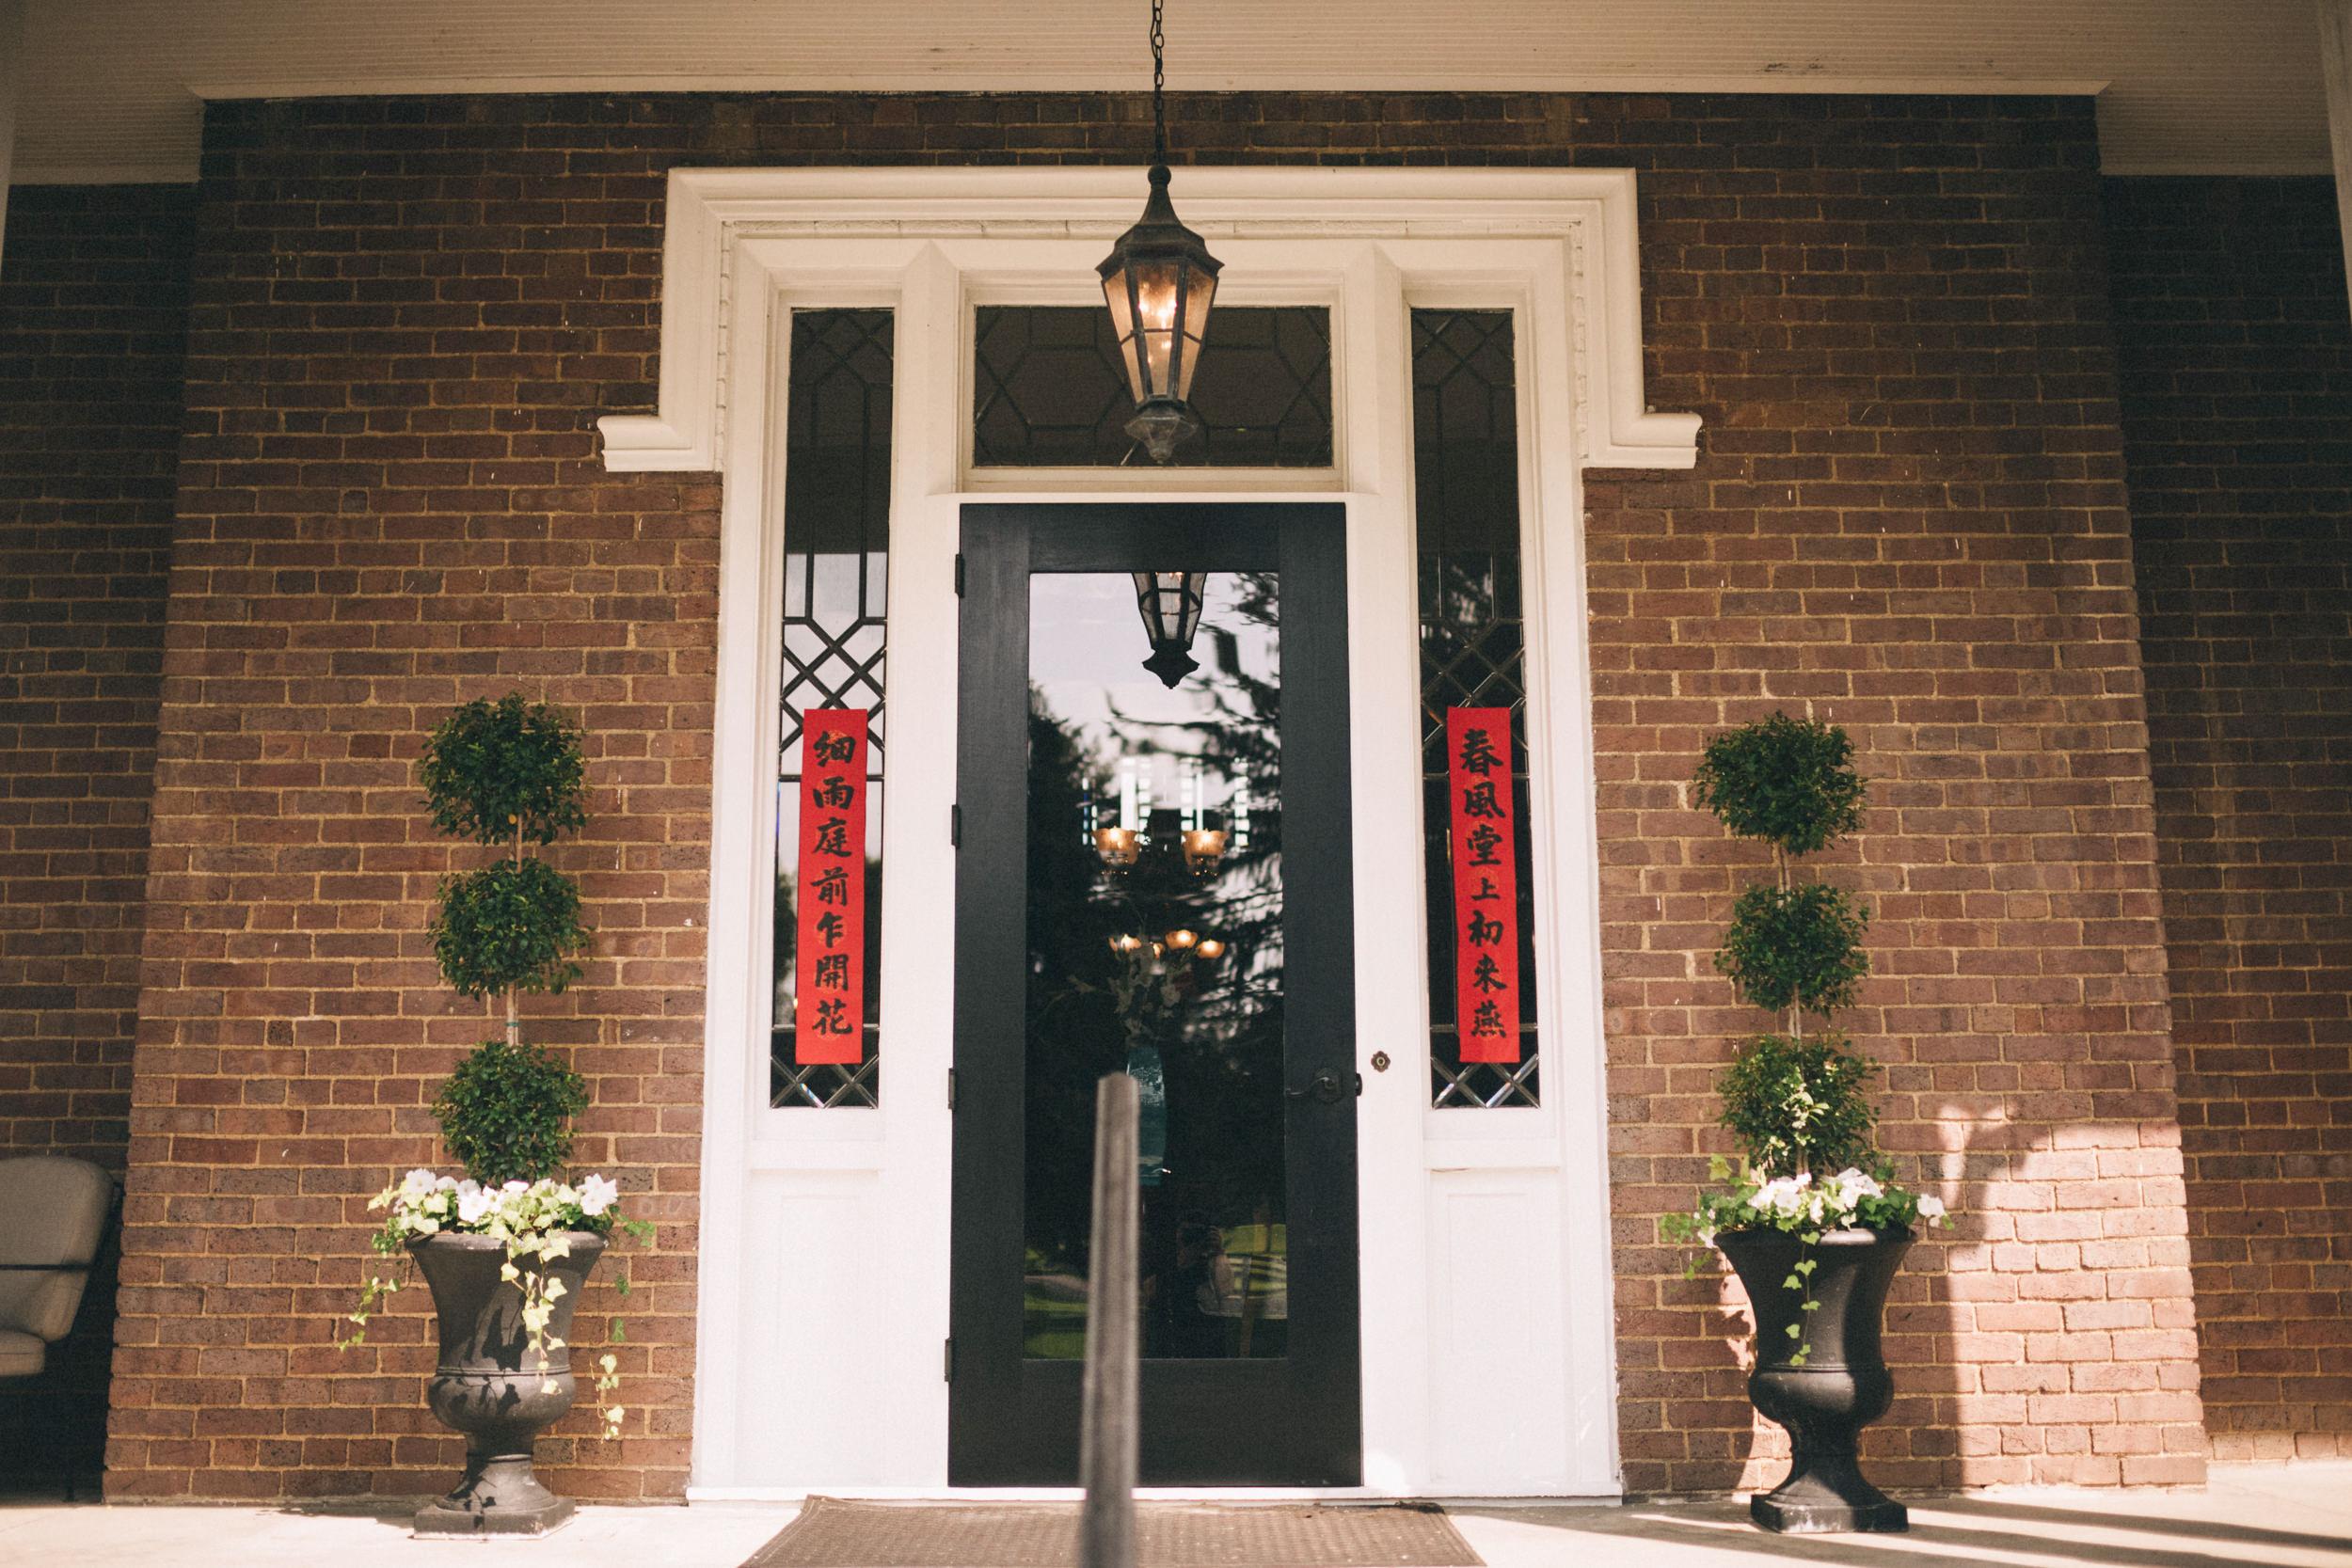 Louisville-Kentucky-Wedding-and-Elopement-Photographer-Sarah-Katherine-Davis-Photography-Summer-Jewel-Toned-Wedding-Chineese-Tea-Ceremony-Warrenwood-Manor-Danville-323.jpg